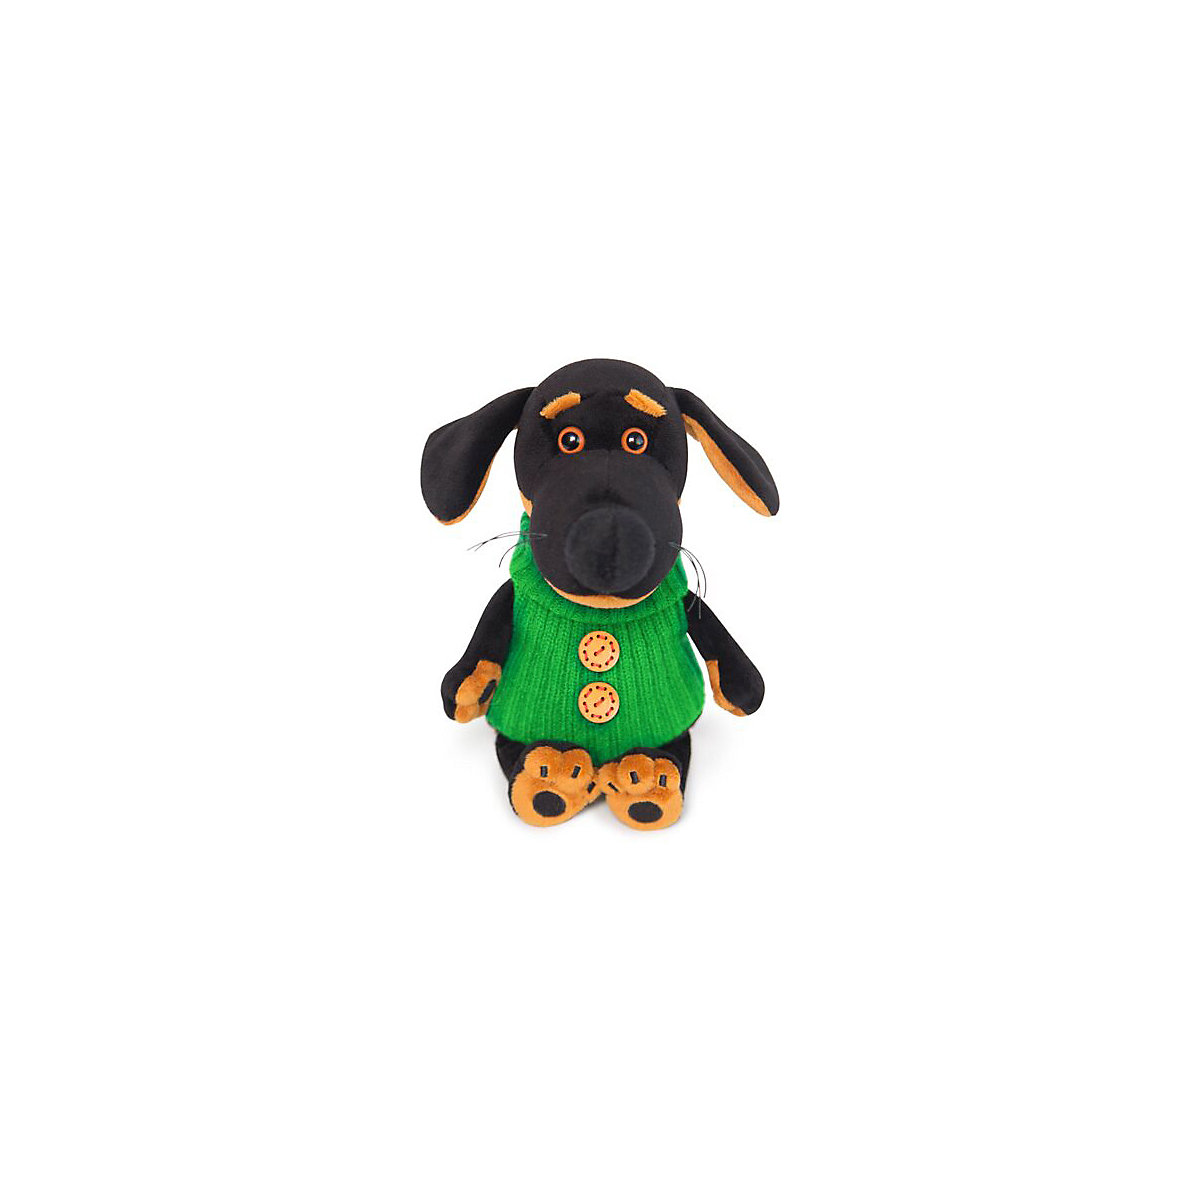 BUDI BASA Stuffed & Plush Animals 10733081 Soft Toy Friend Animal Girl Boy Play Game Girls Boys